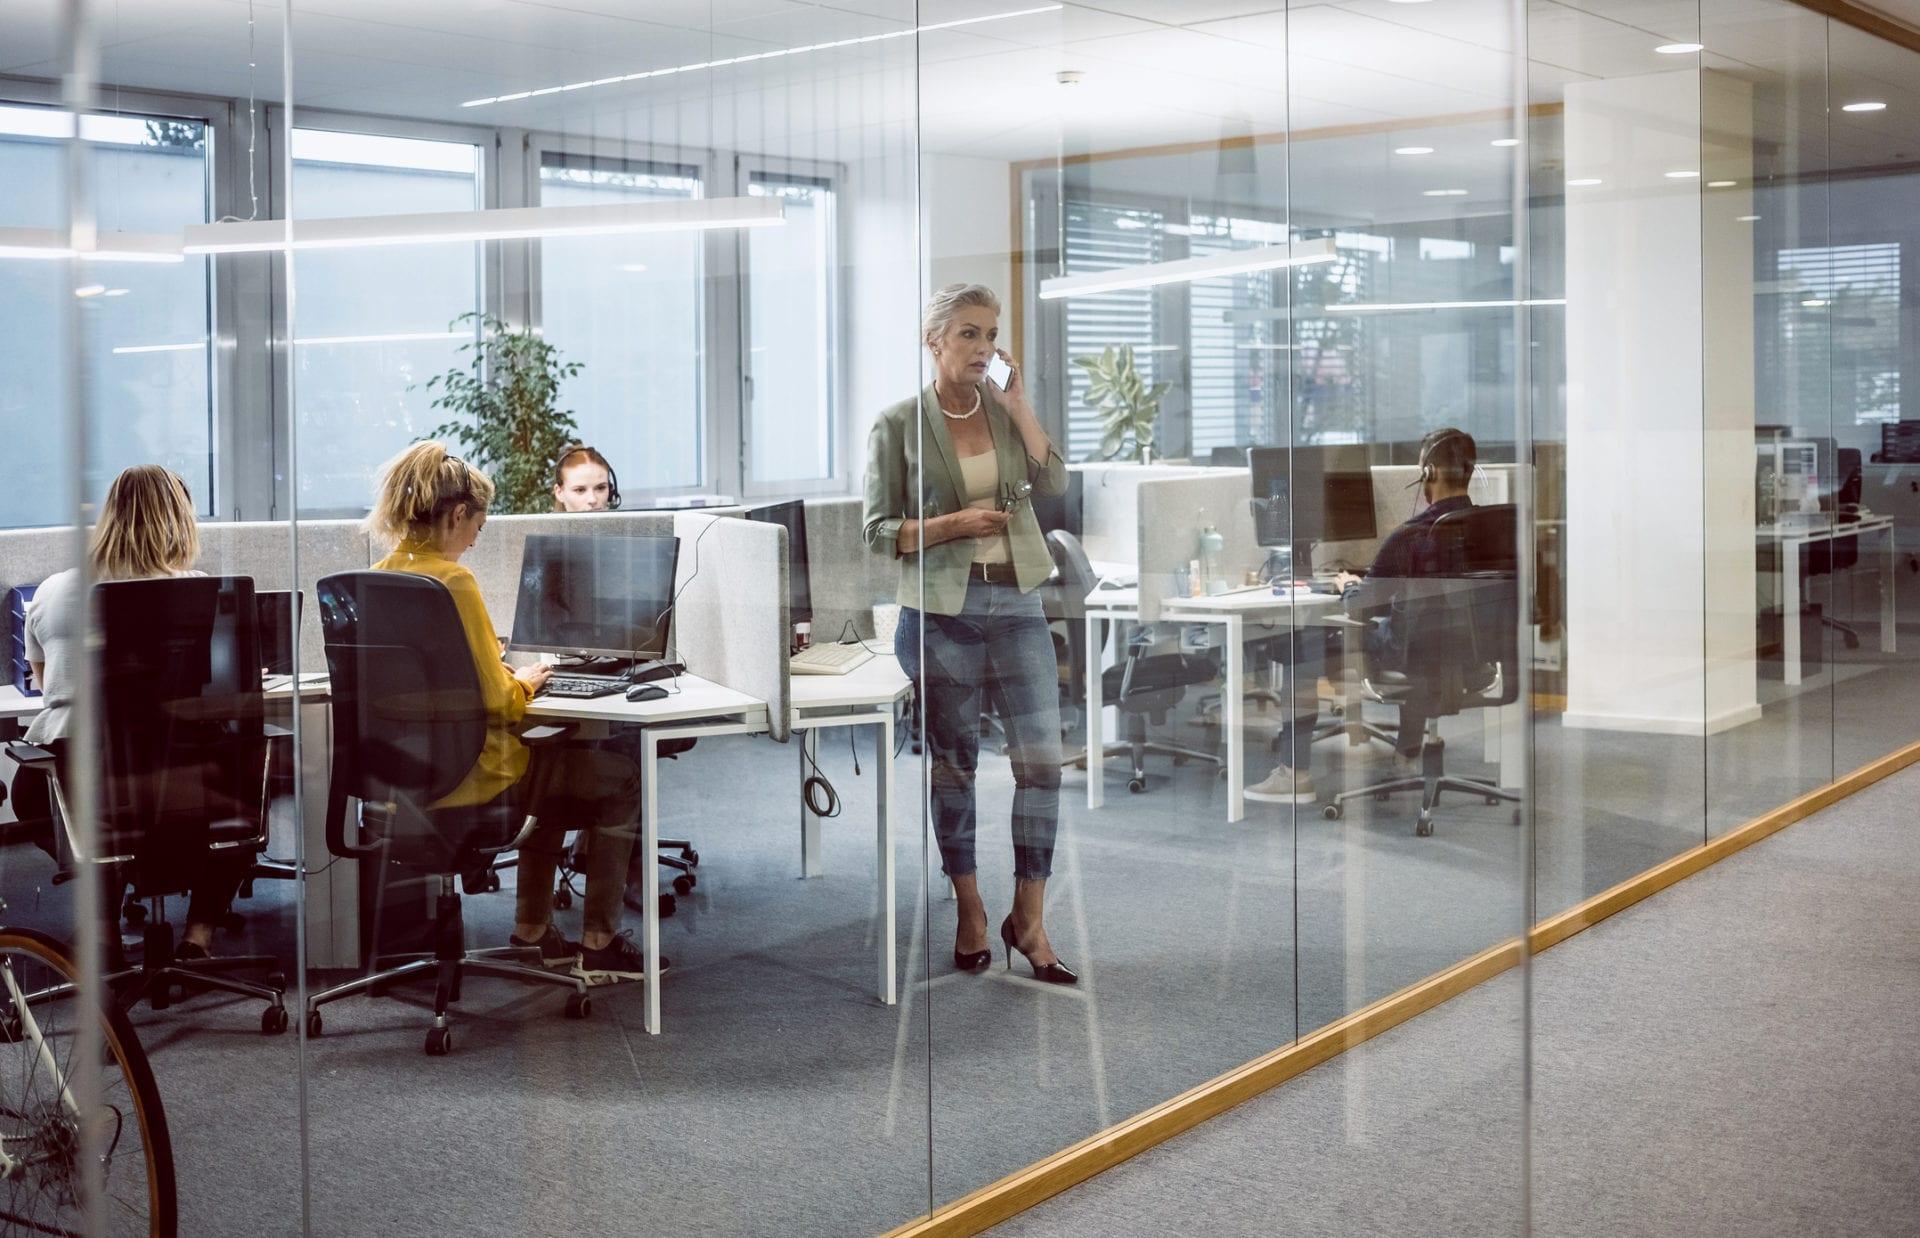 customer service team in office adopt digital transformation approach